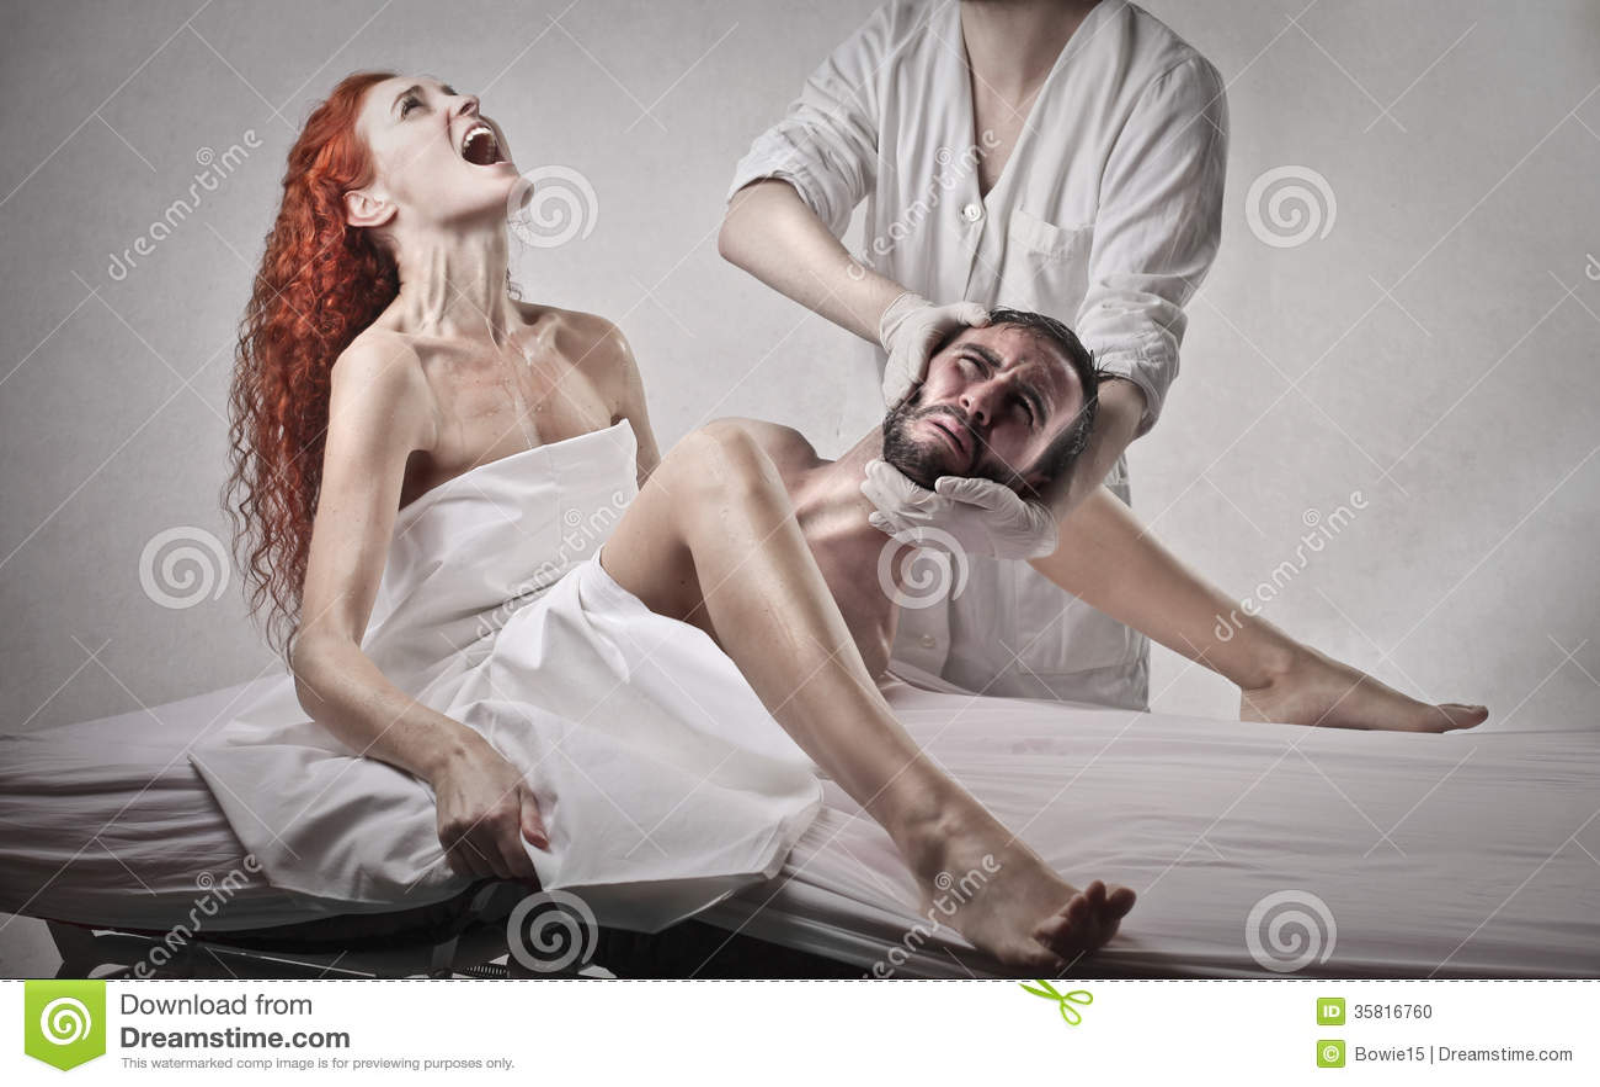 legless woman gives birth